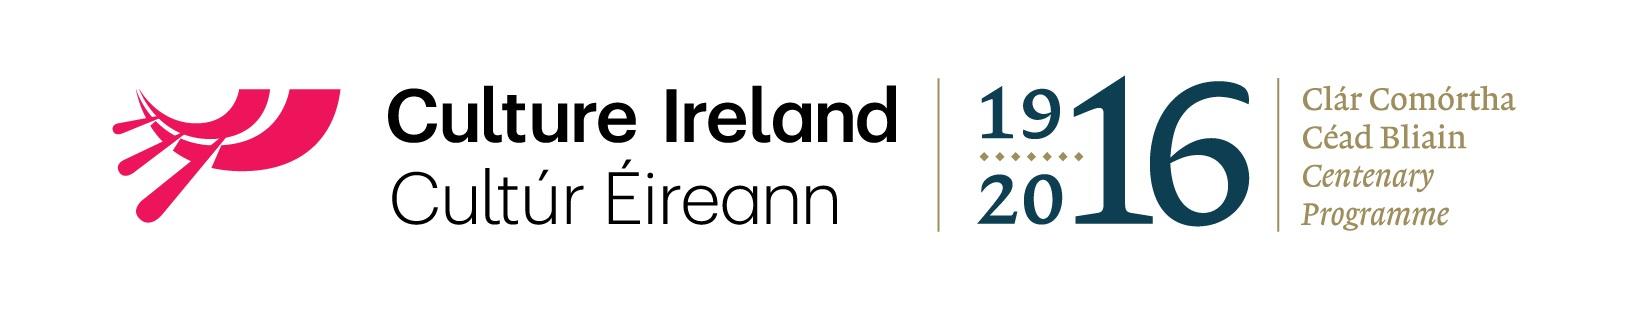 04 Culture_Ireland-2016_Colour.jpg